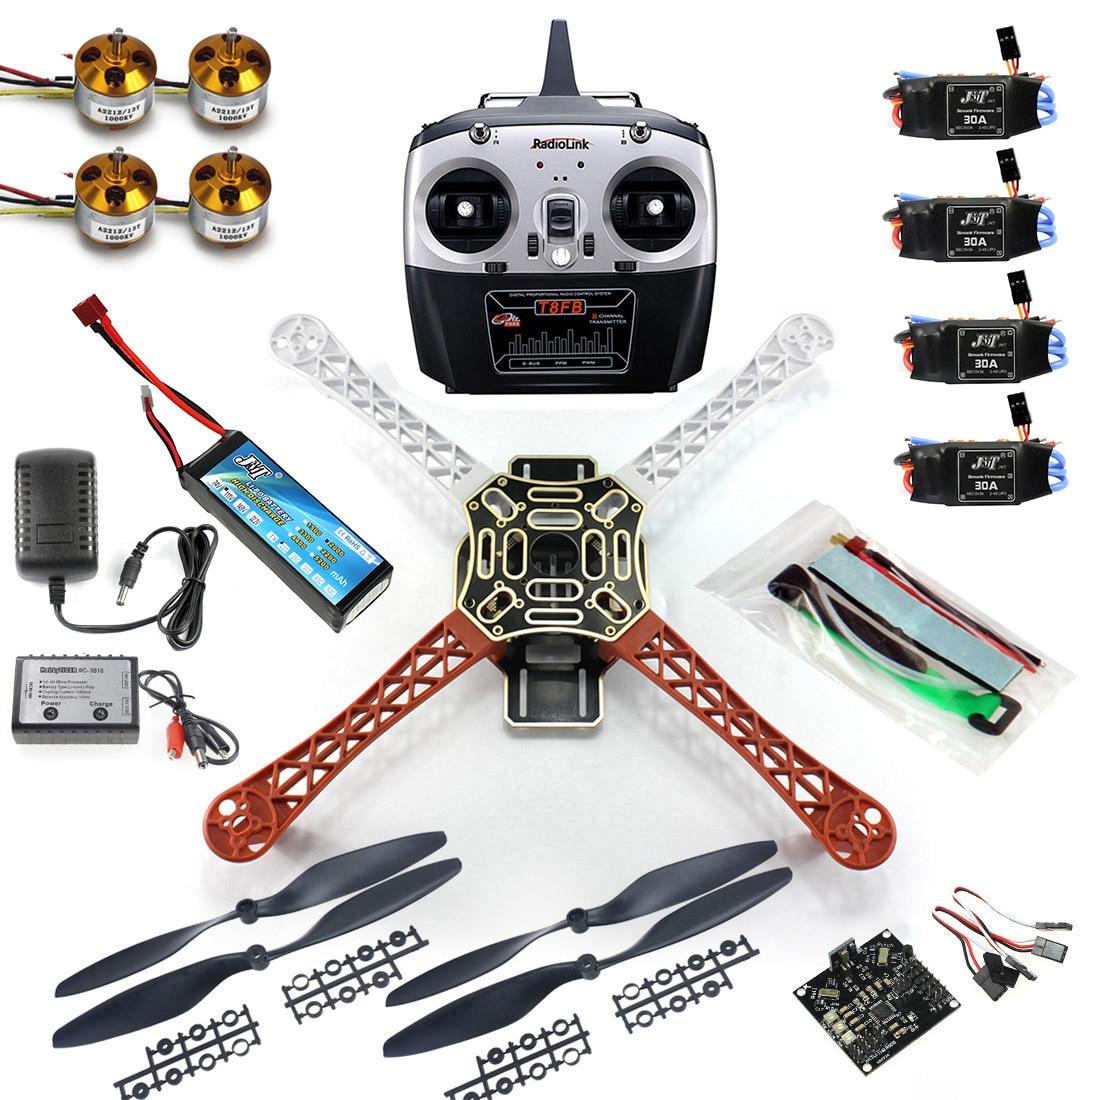 JMT 4 eje RC Multi QuadCopter Drone RTF ARF KK V2.3 placa de circuito 1000KV Motor 30A CES Lipo F450 Kit de marco de T8FB TX